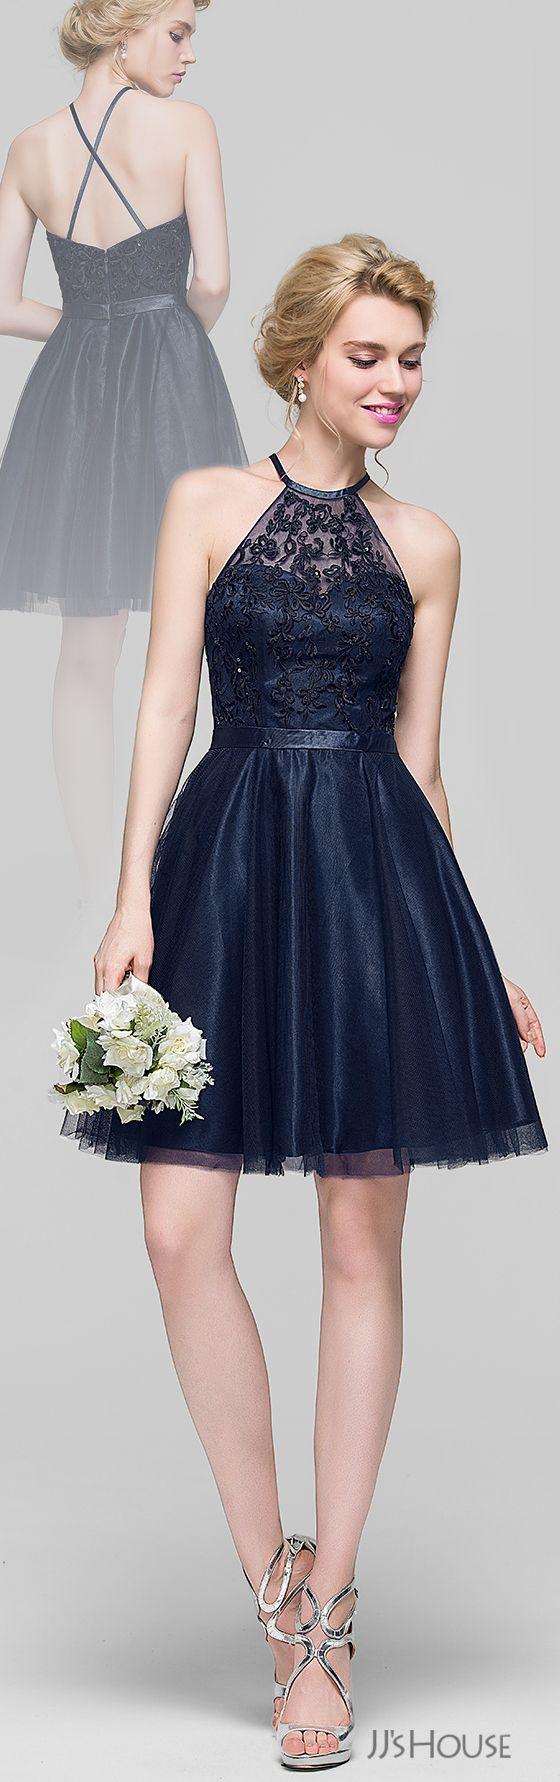 best mi vestido images on pinterest cute dresses classy